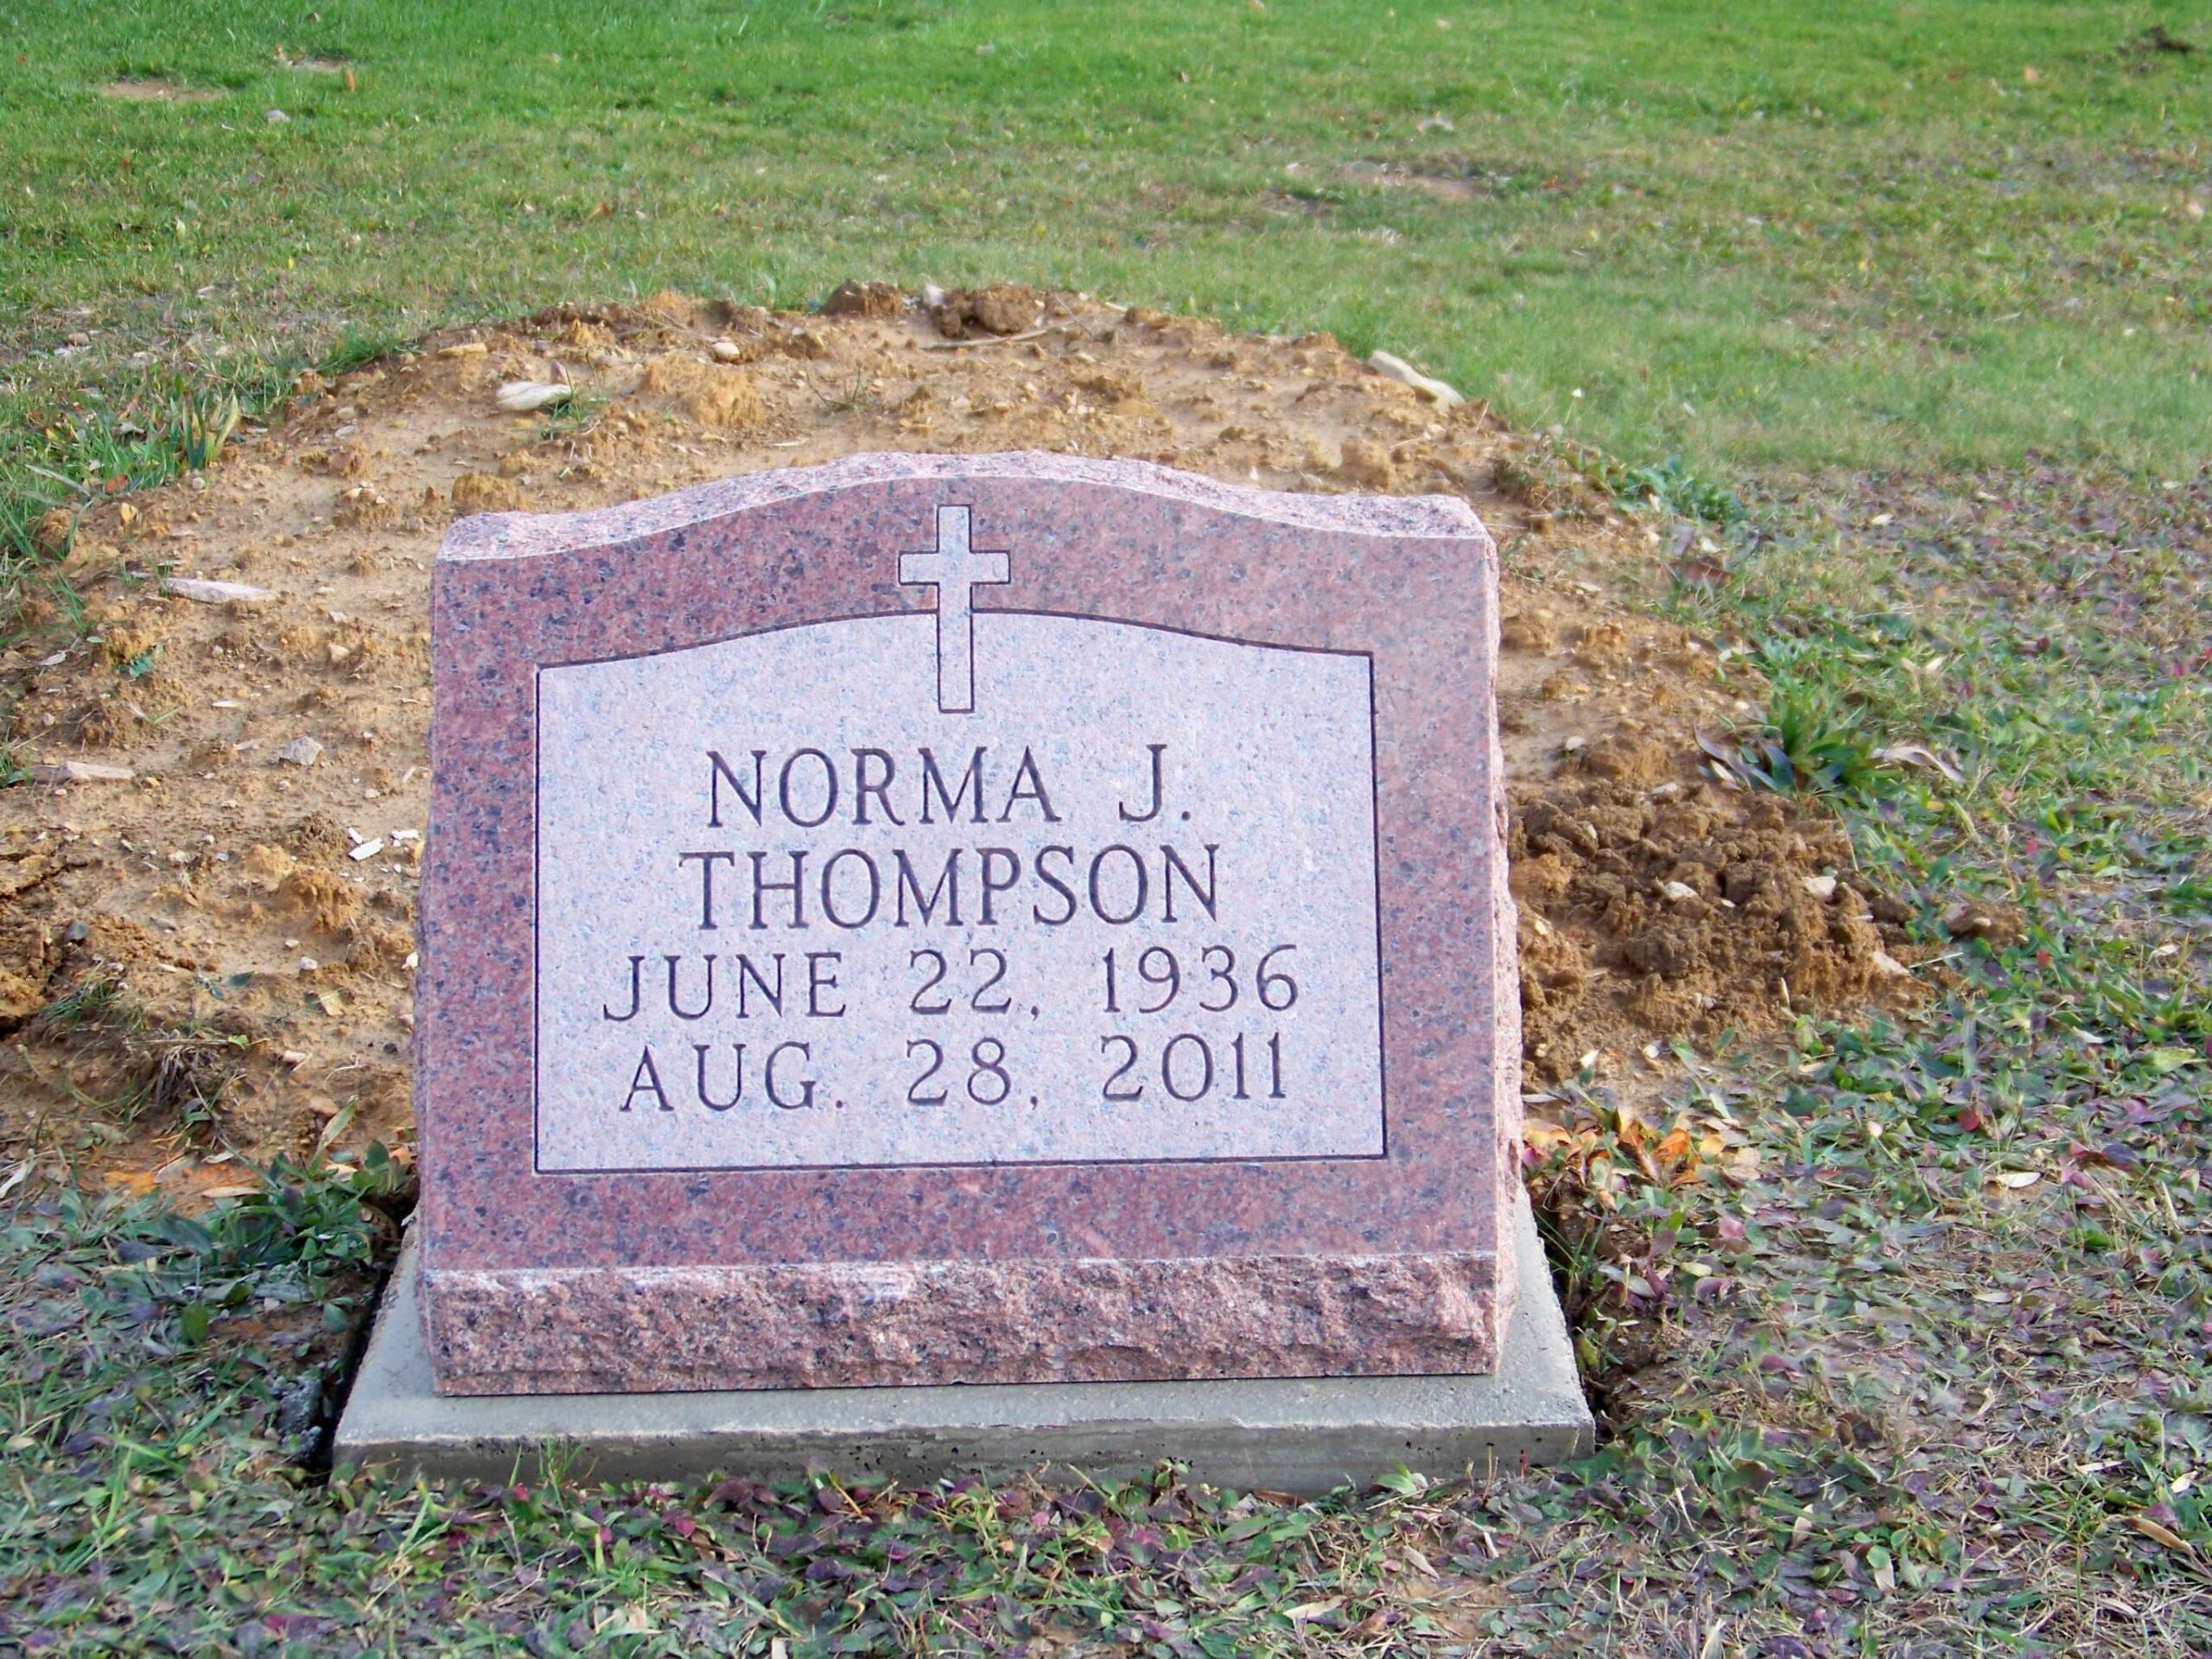 Thompson, Norma J.